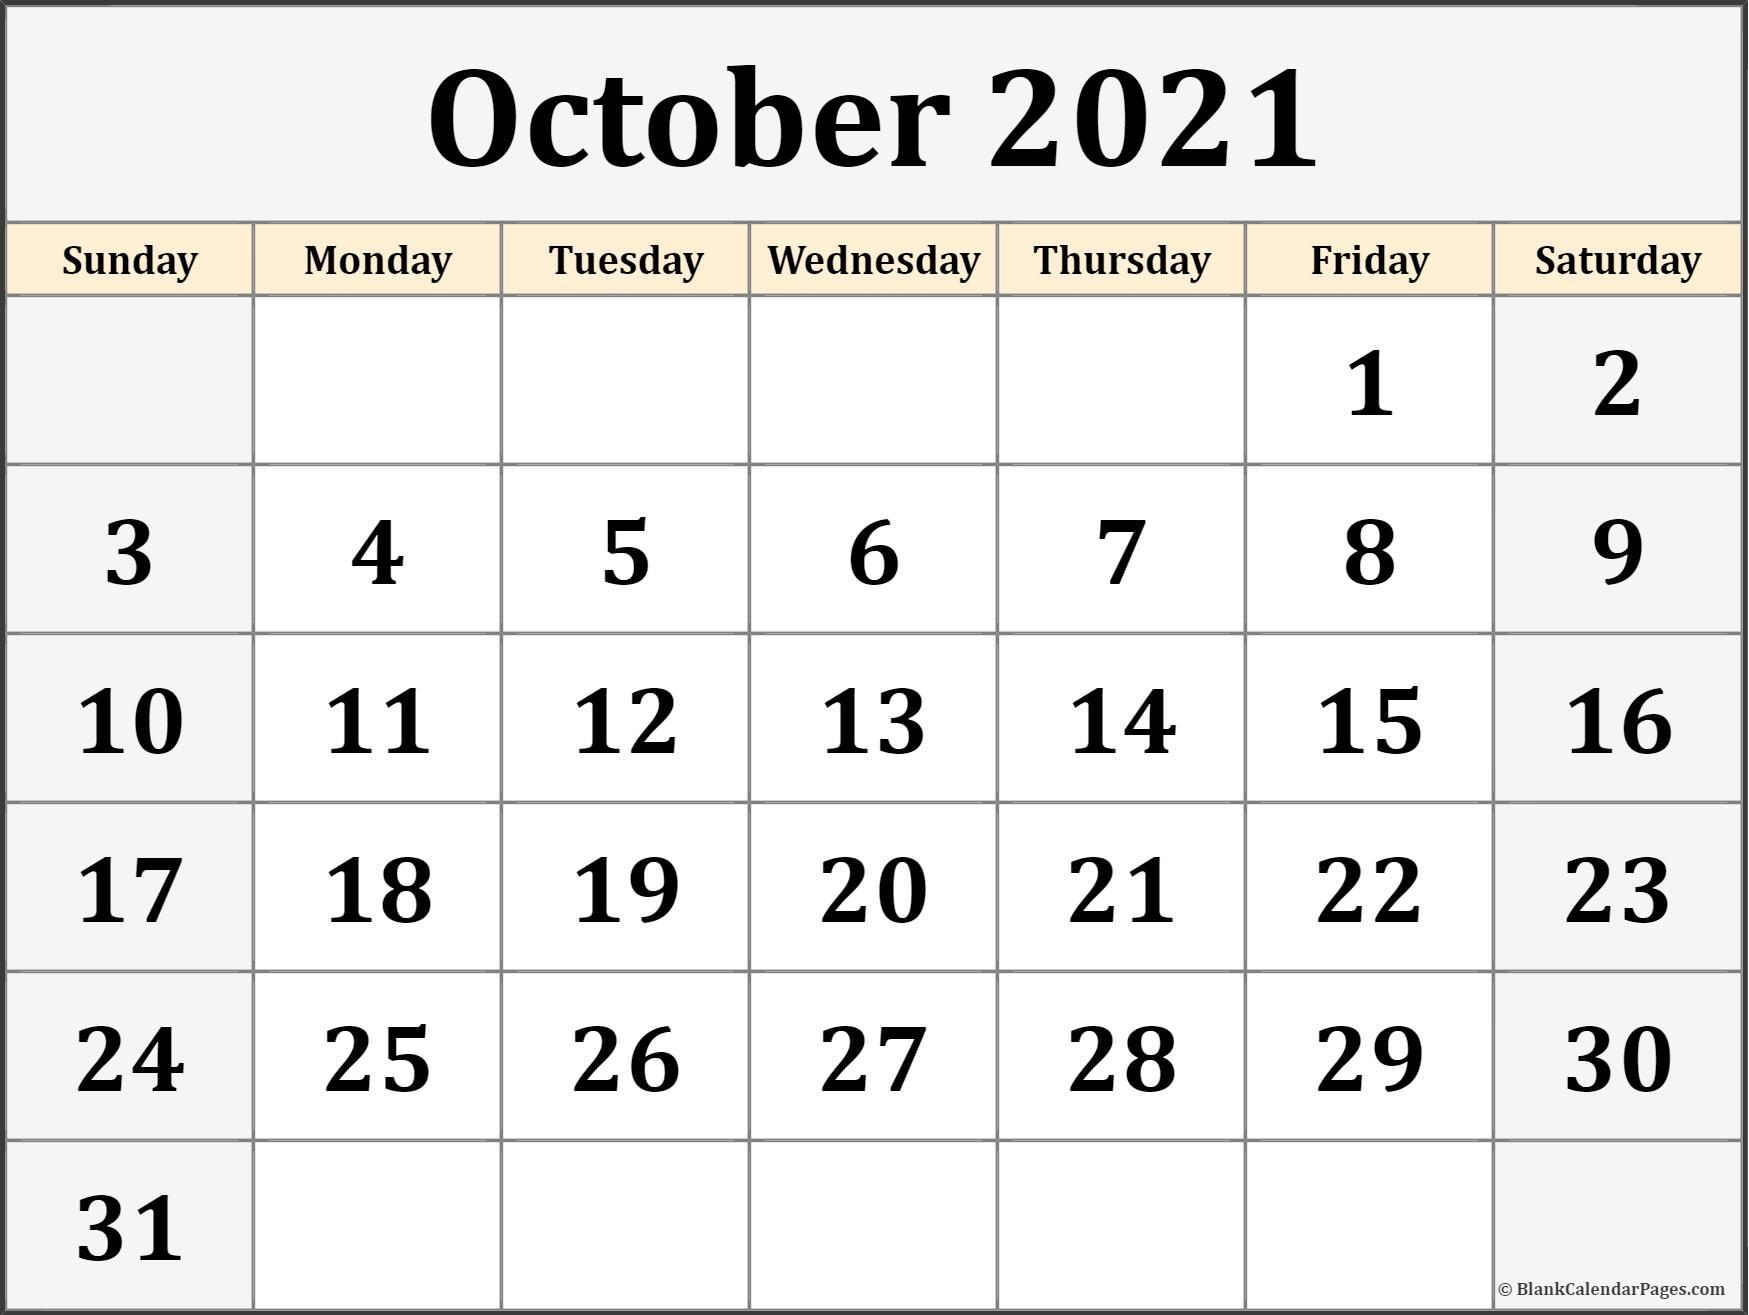 October 2021 Calendar Free Printable Monthly Calendars 3